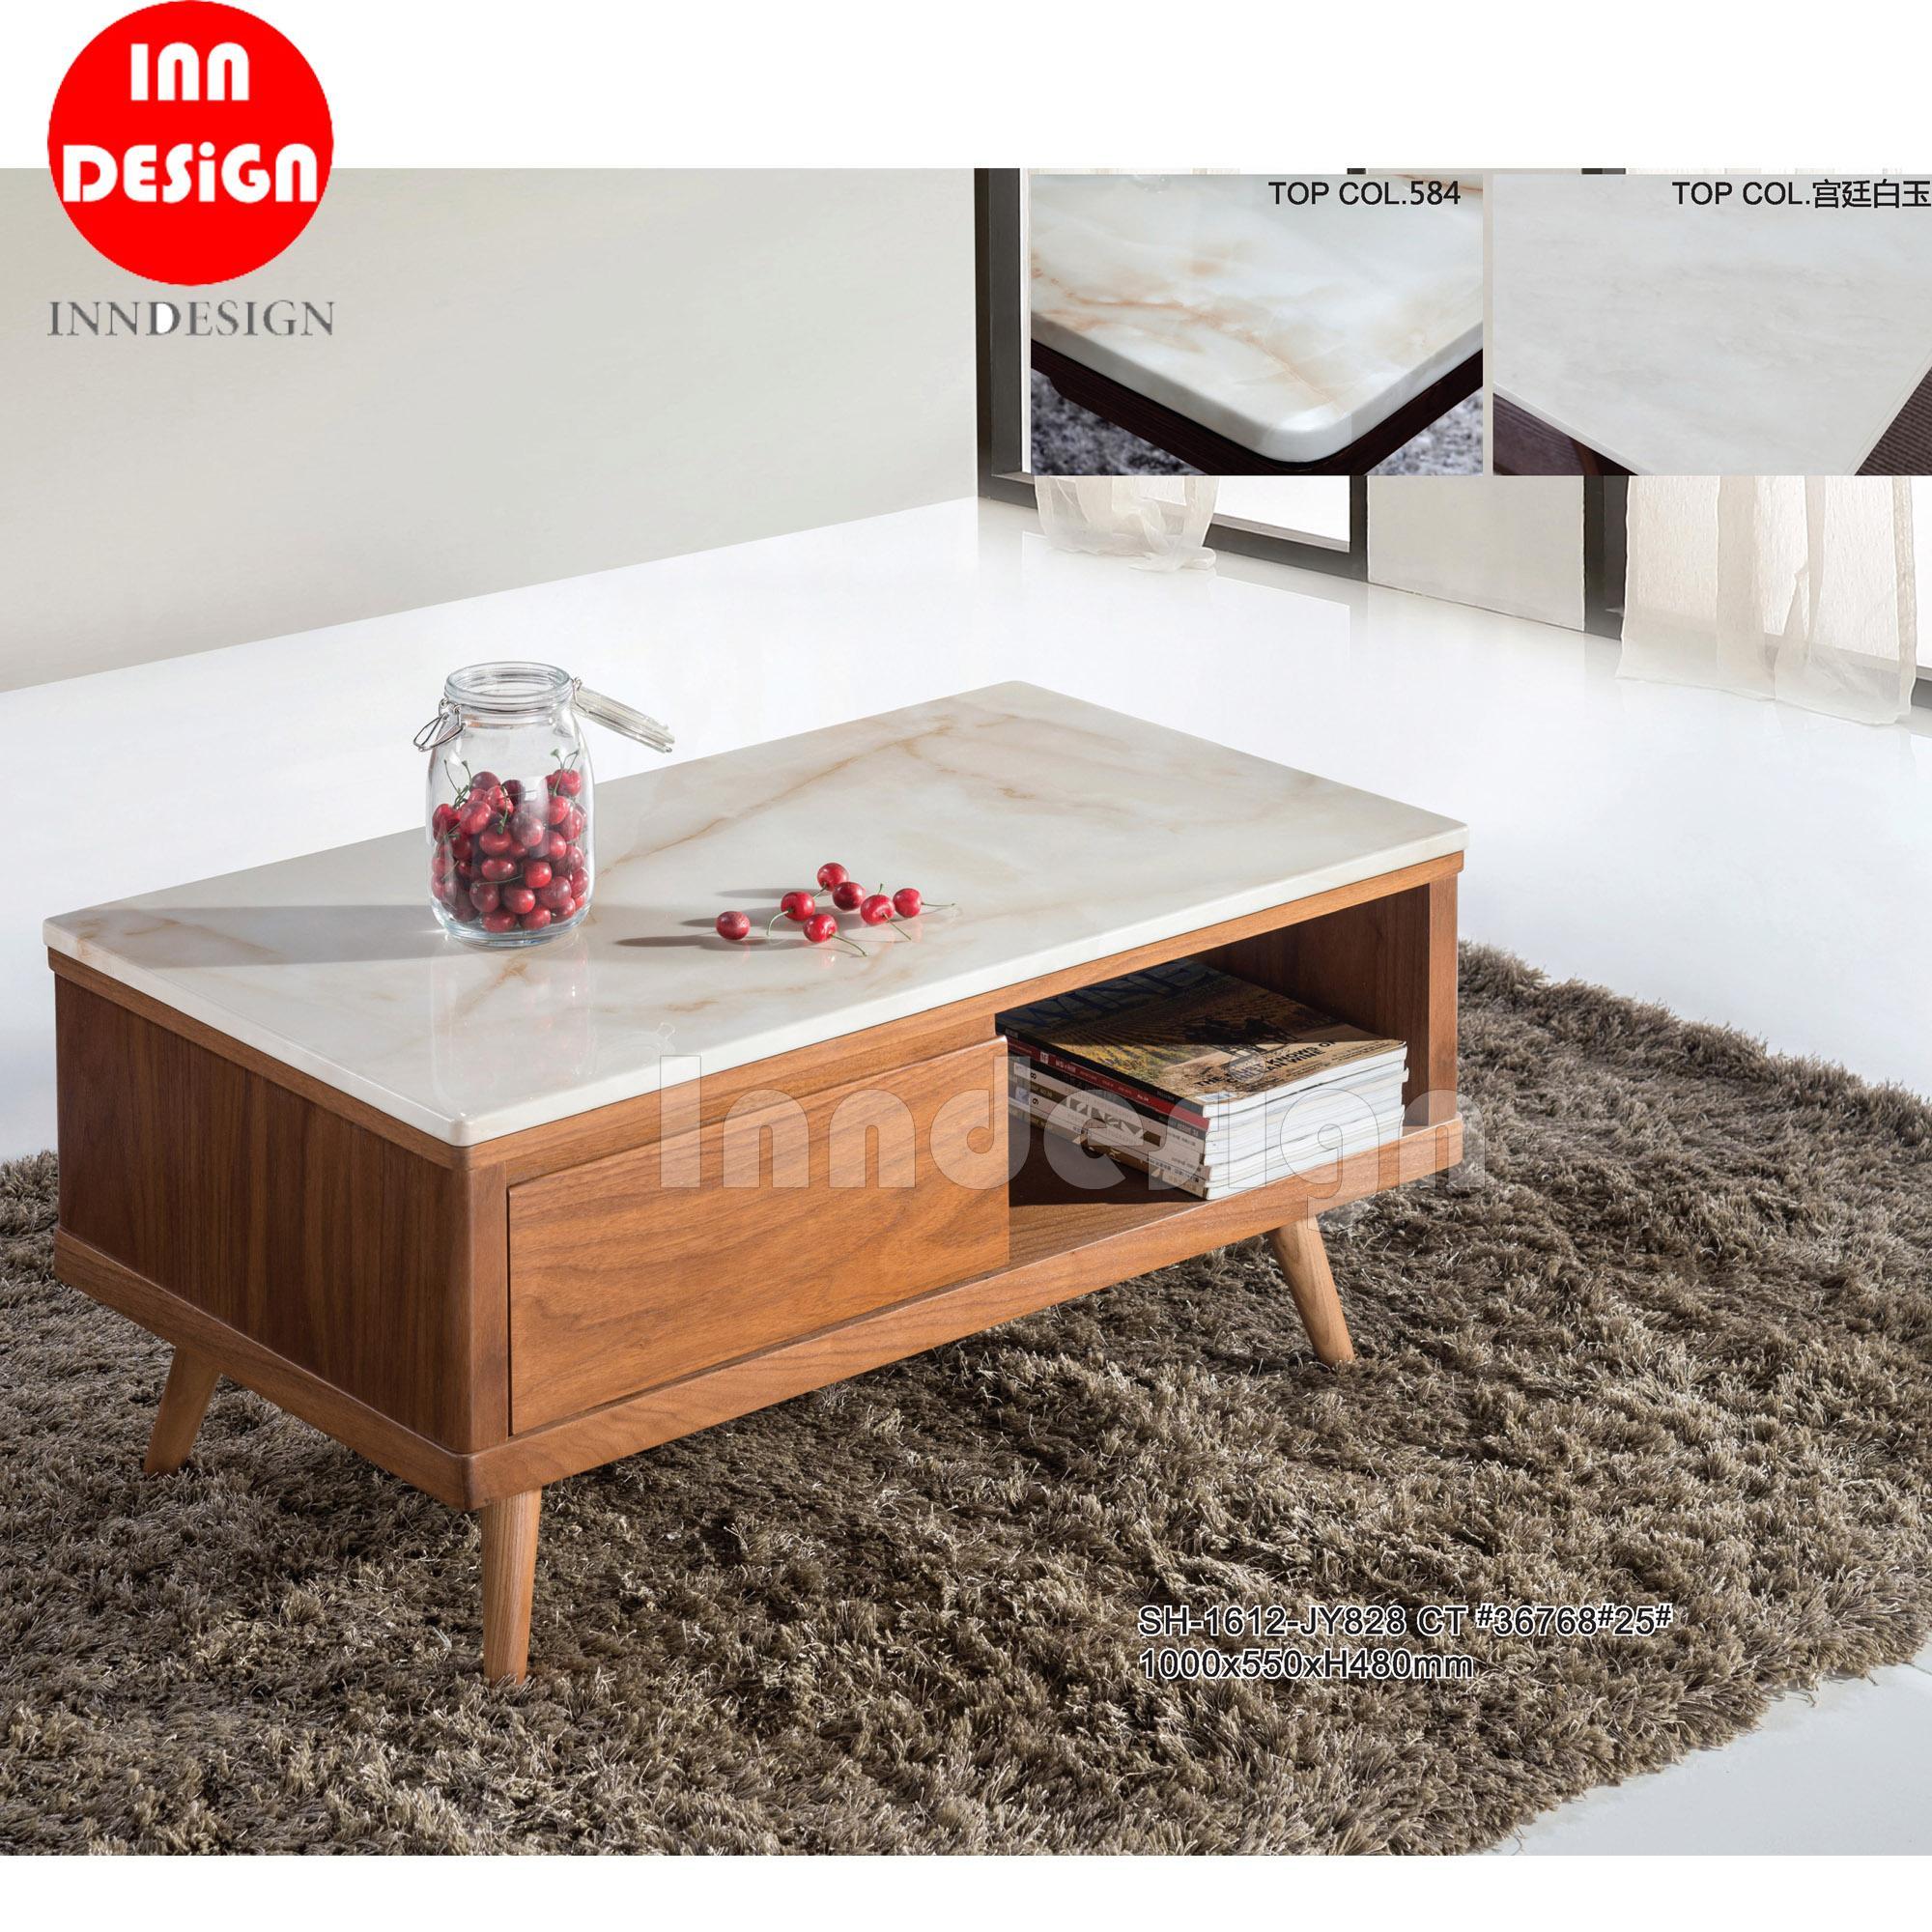 Venery Marble Top Coffee Table